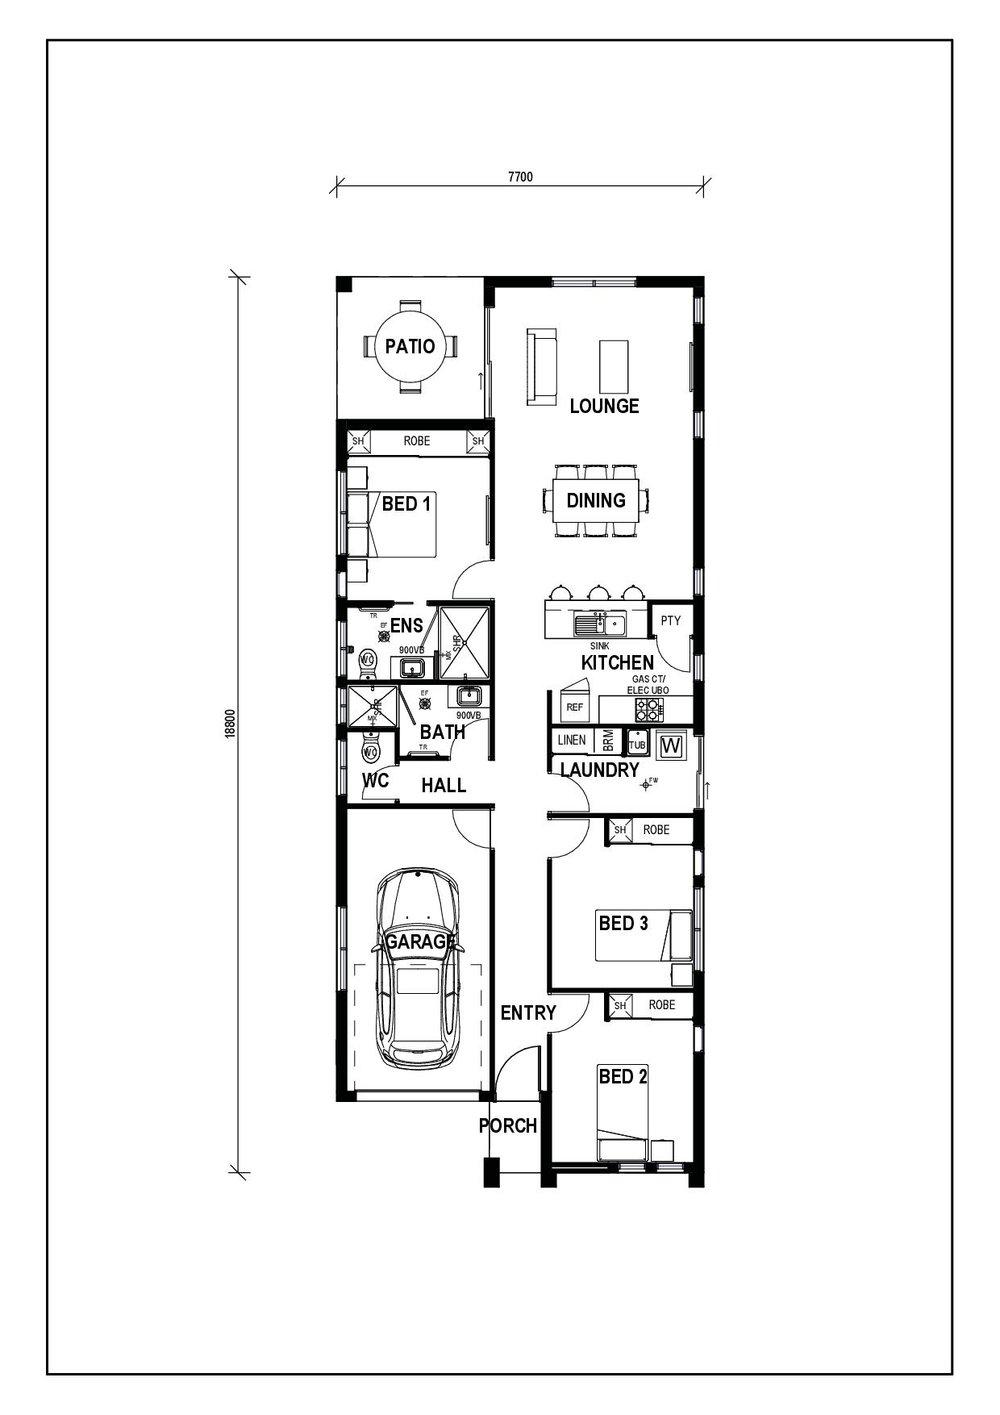 Culmara C Floor Plan.jpg